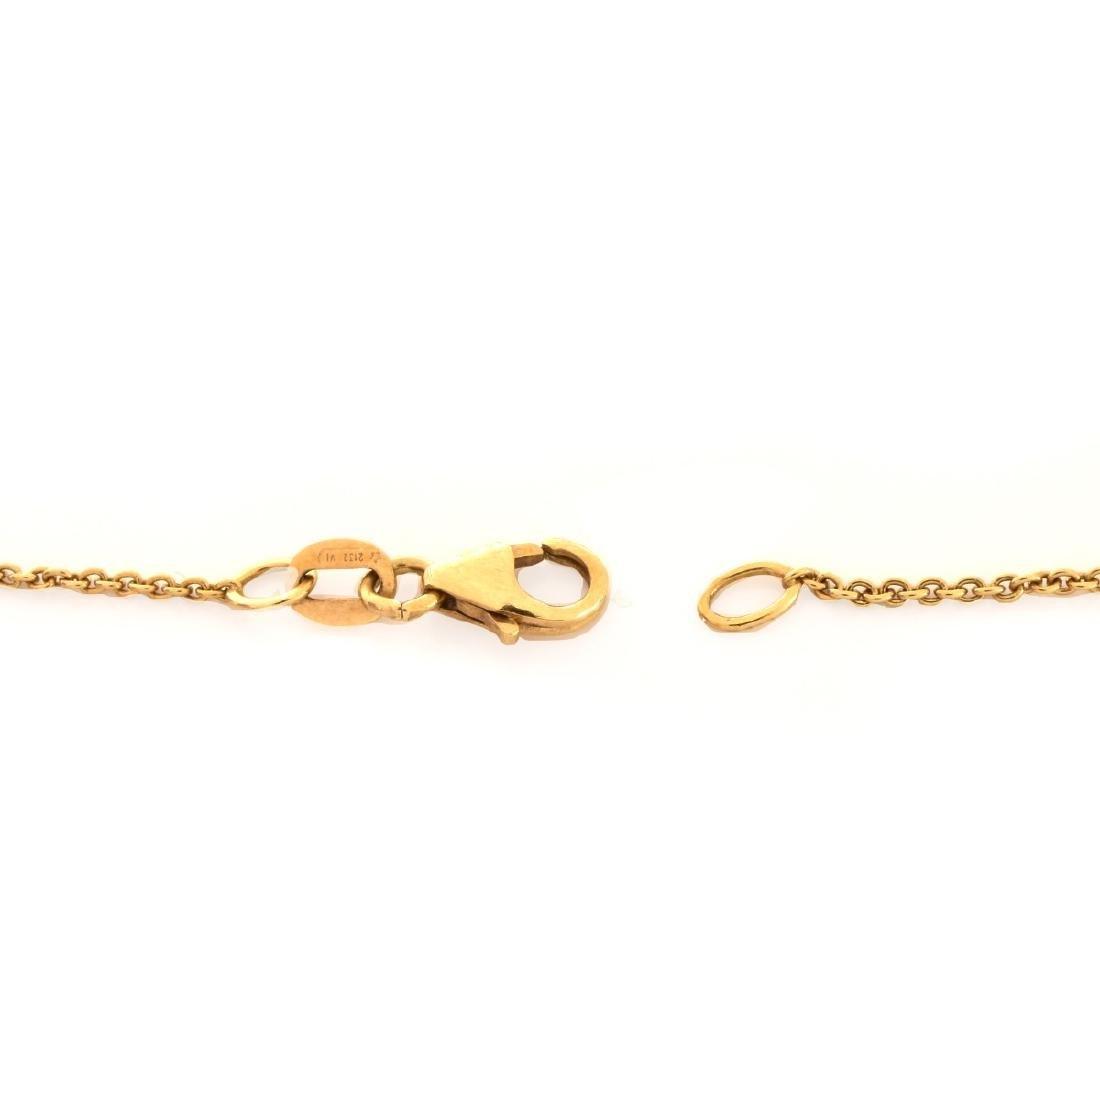 Emerald, Diamond and 18K Gold Pendant Necklace - 4